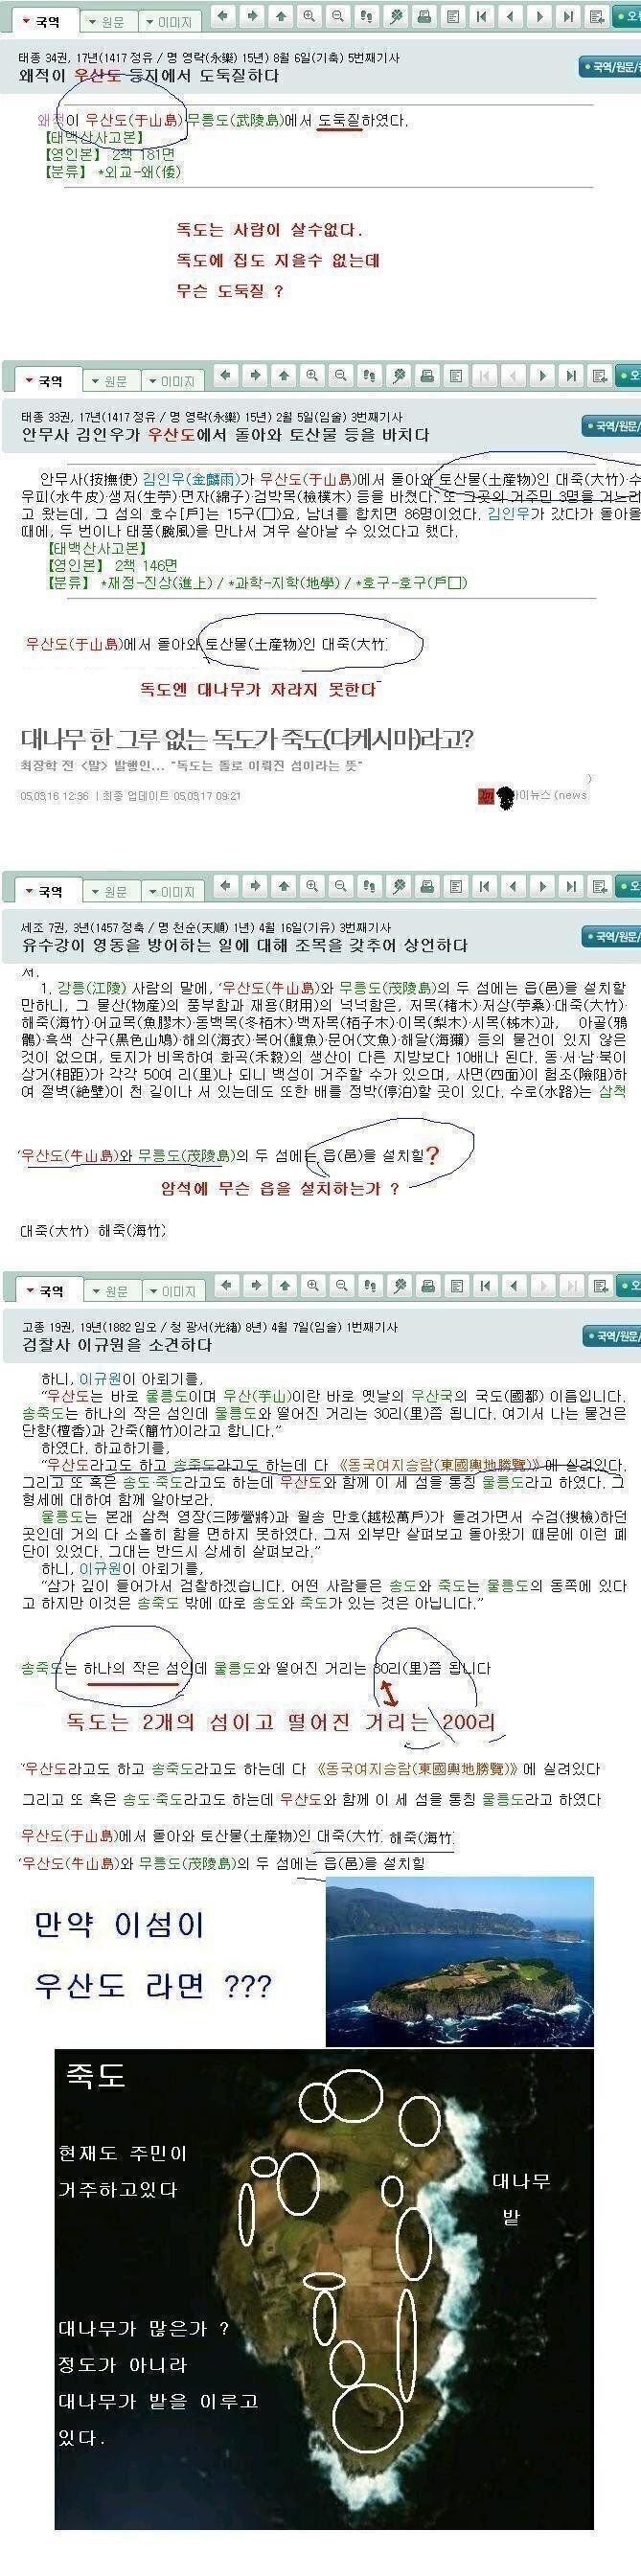 viewimage.php?id=25b8dc2aeedd2aa36f&no=24b0d769e1d32ca73cec8ffa11d0283137a147df66c0ff0e9ff48c5b5e7e56dda98b65e532372239c4b96c9aafd2cff03ee43b9f5dd565c2682d586b9e47b279055714a0628d2e13dde723f88354f310051bc4b296e8